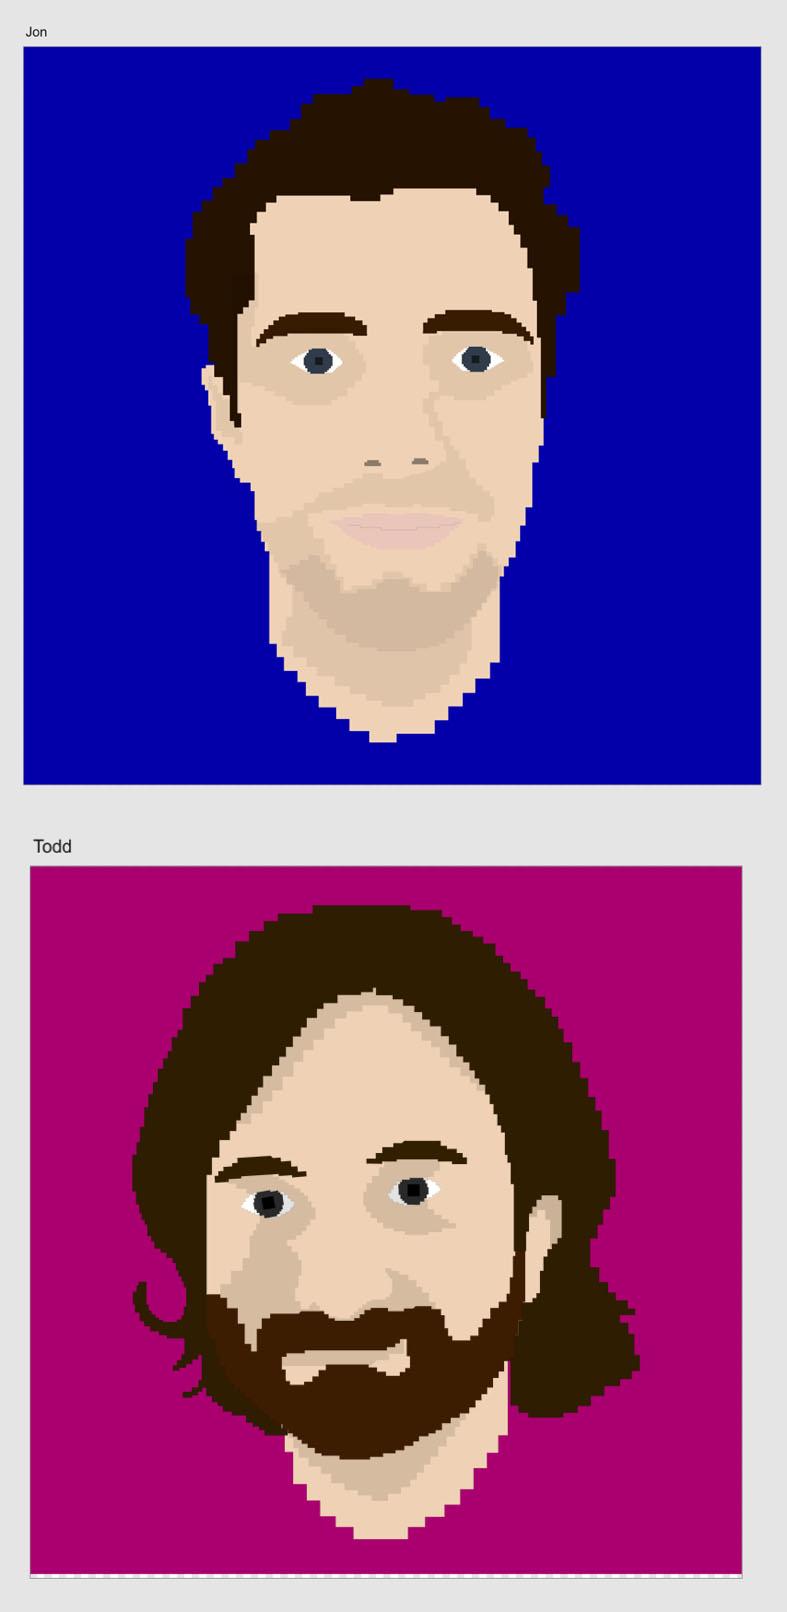 Jon_profile+copy.jpg